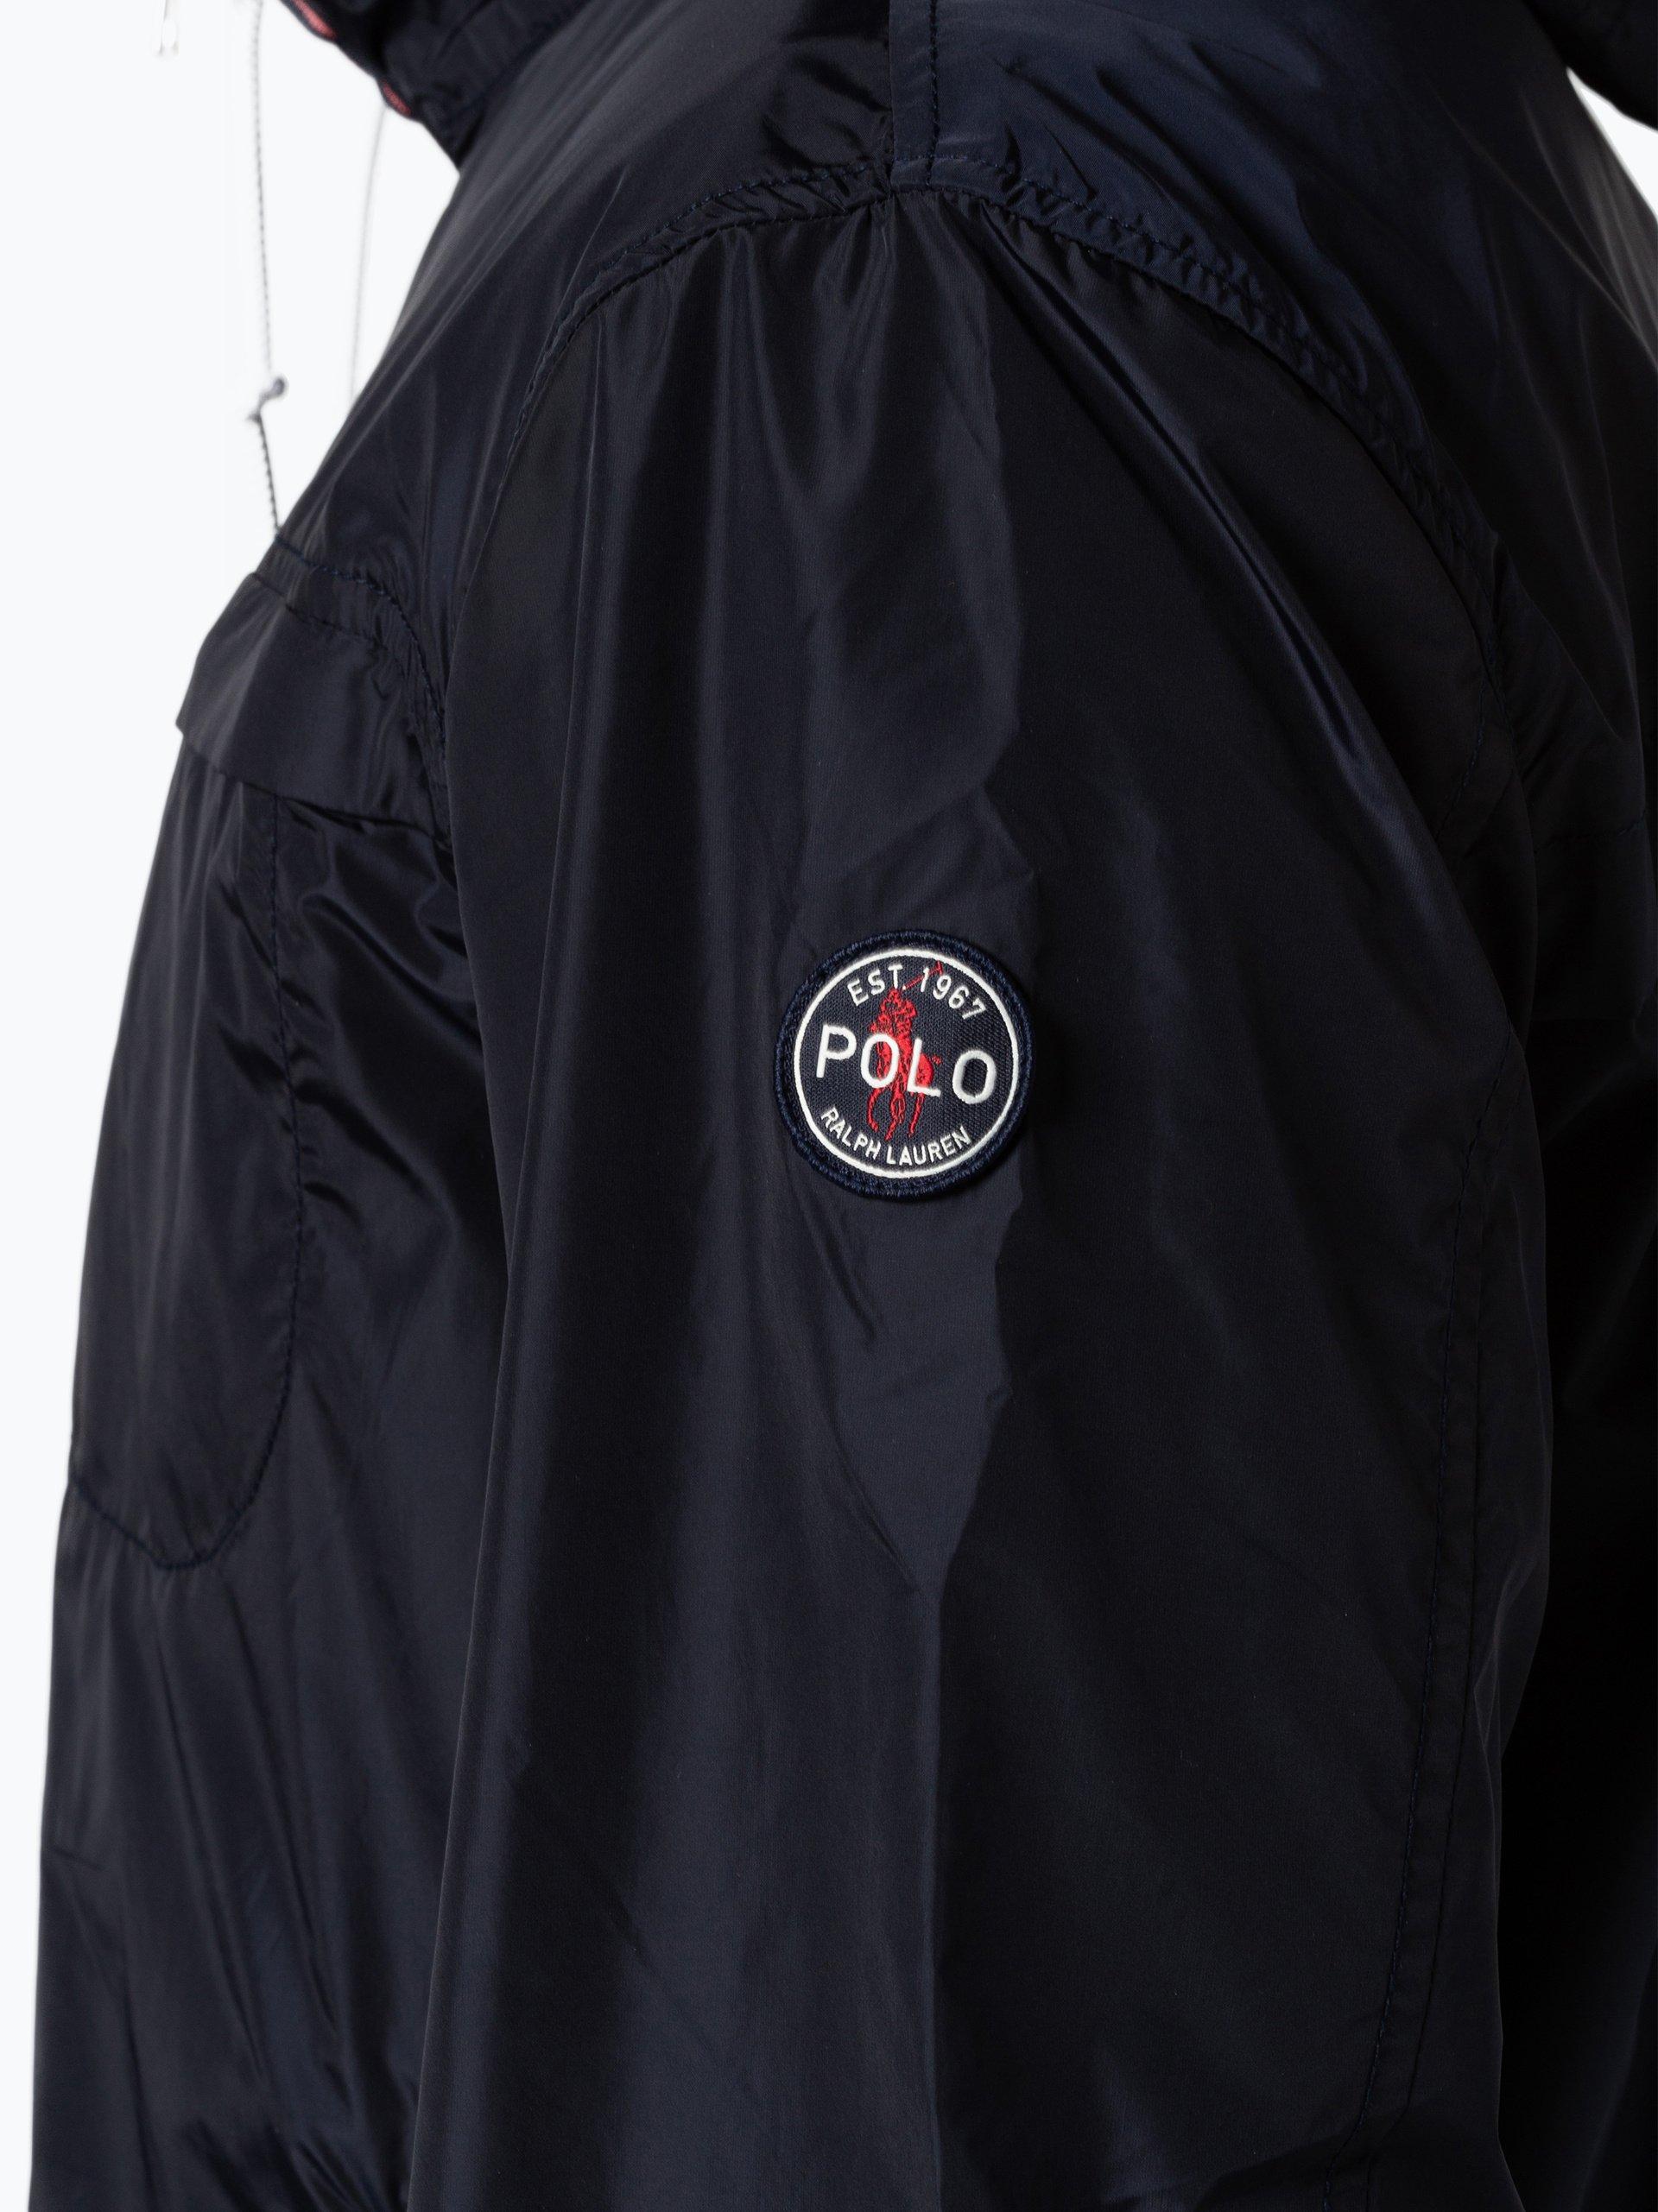 Polo Ralph Lauren Kurtka męska